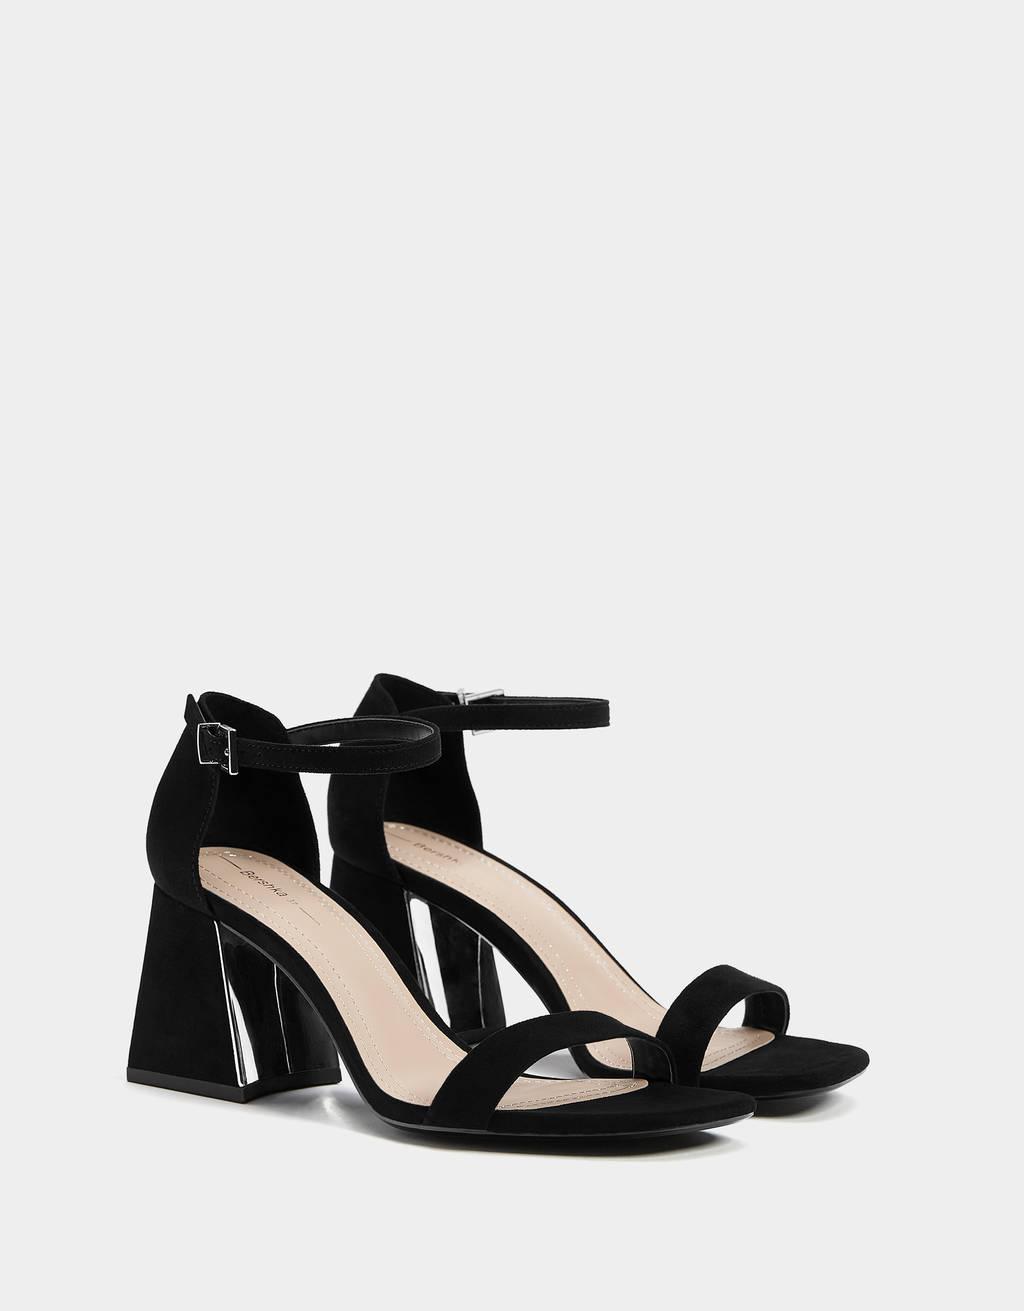 Metalik topuklu sandalet